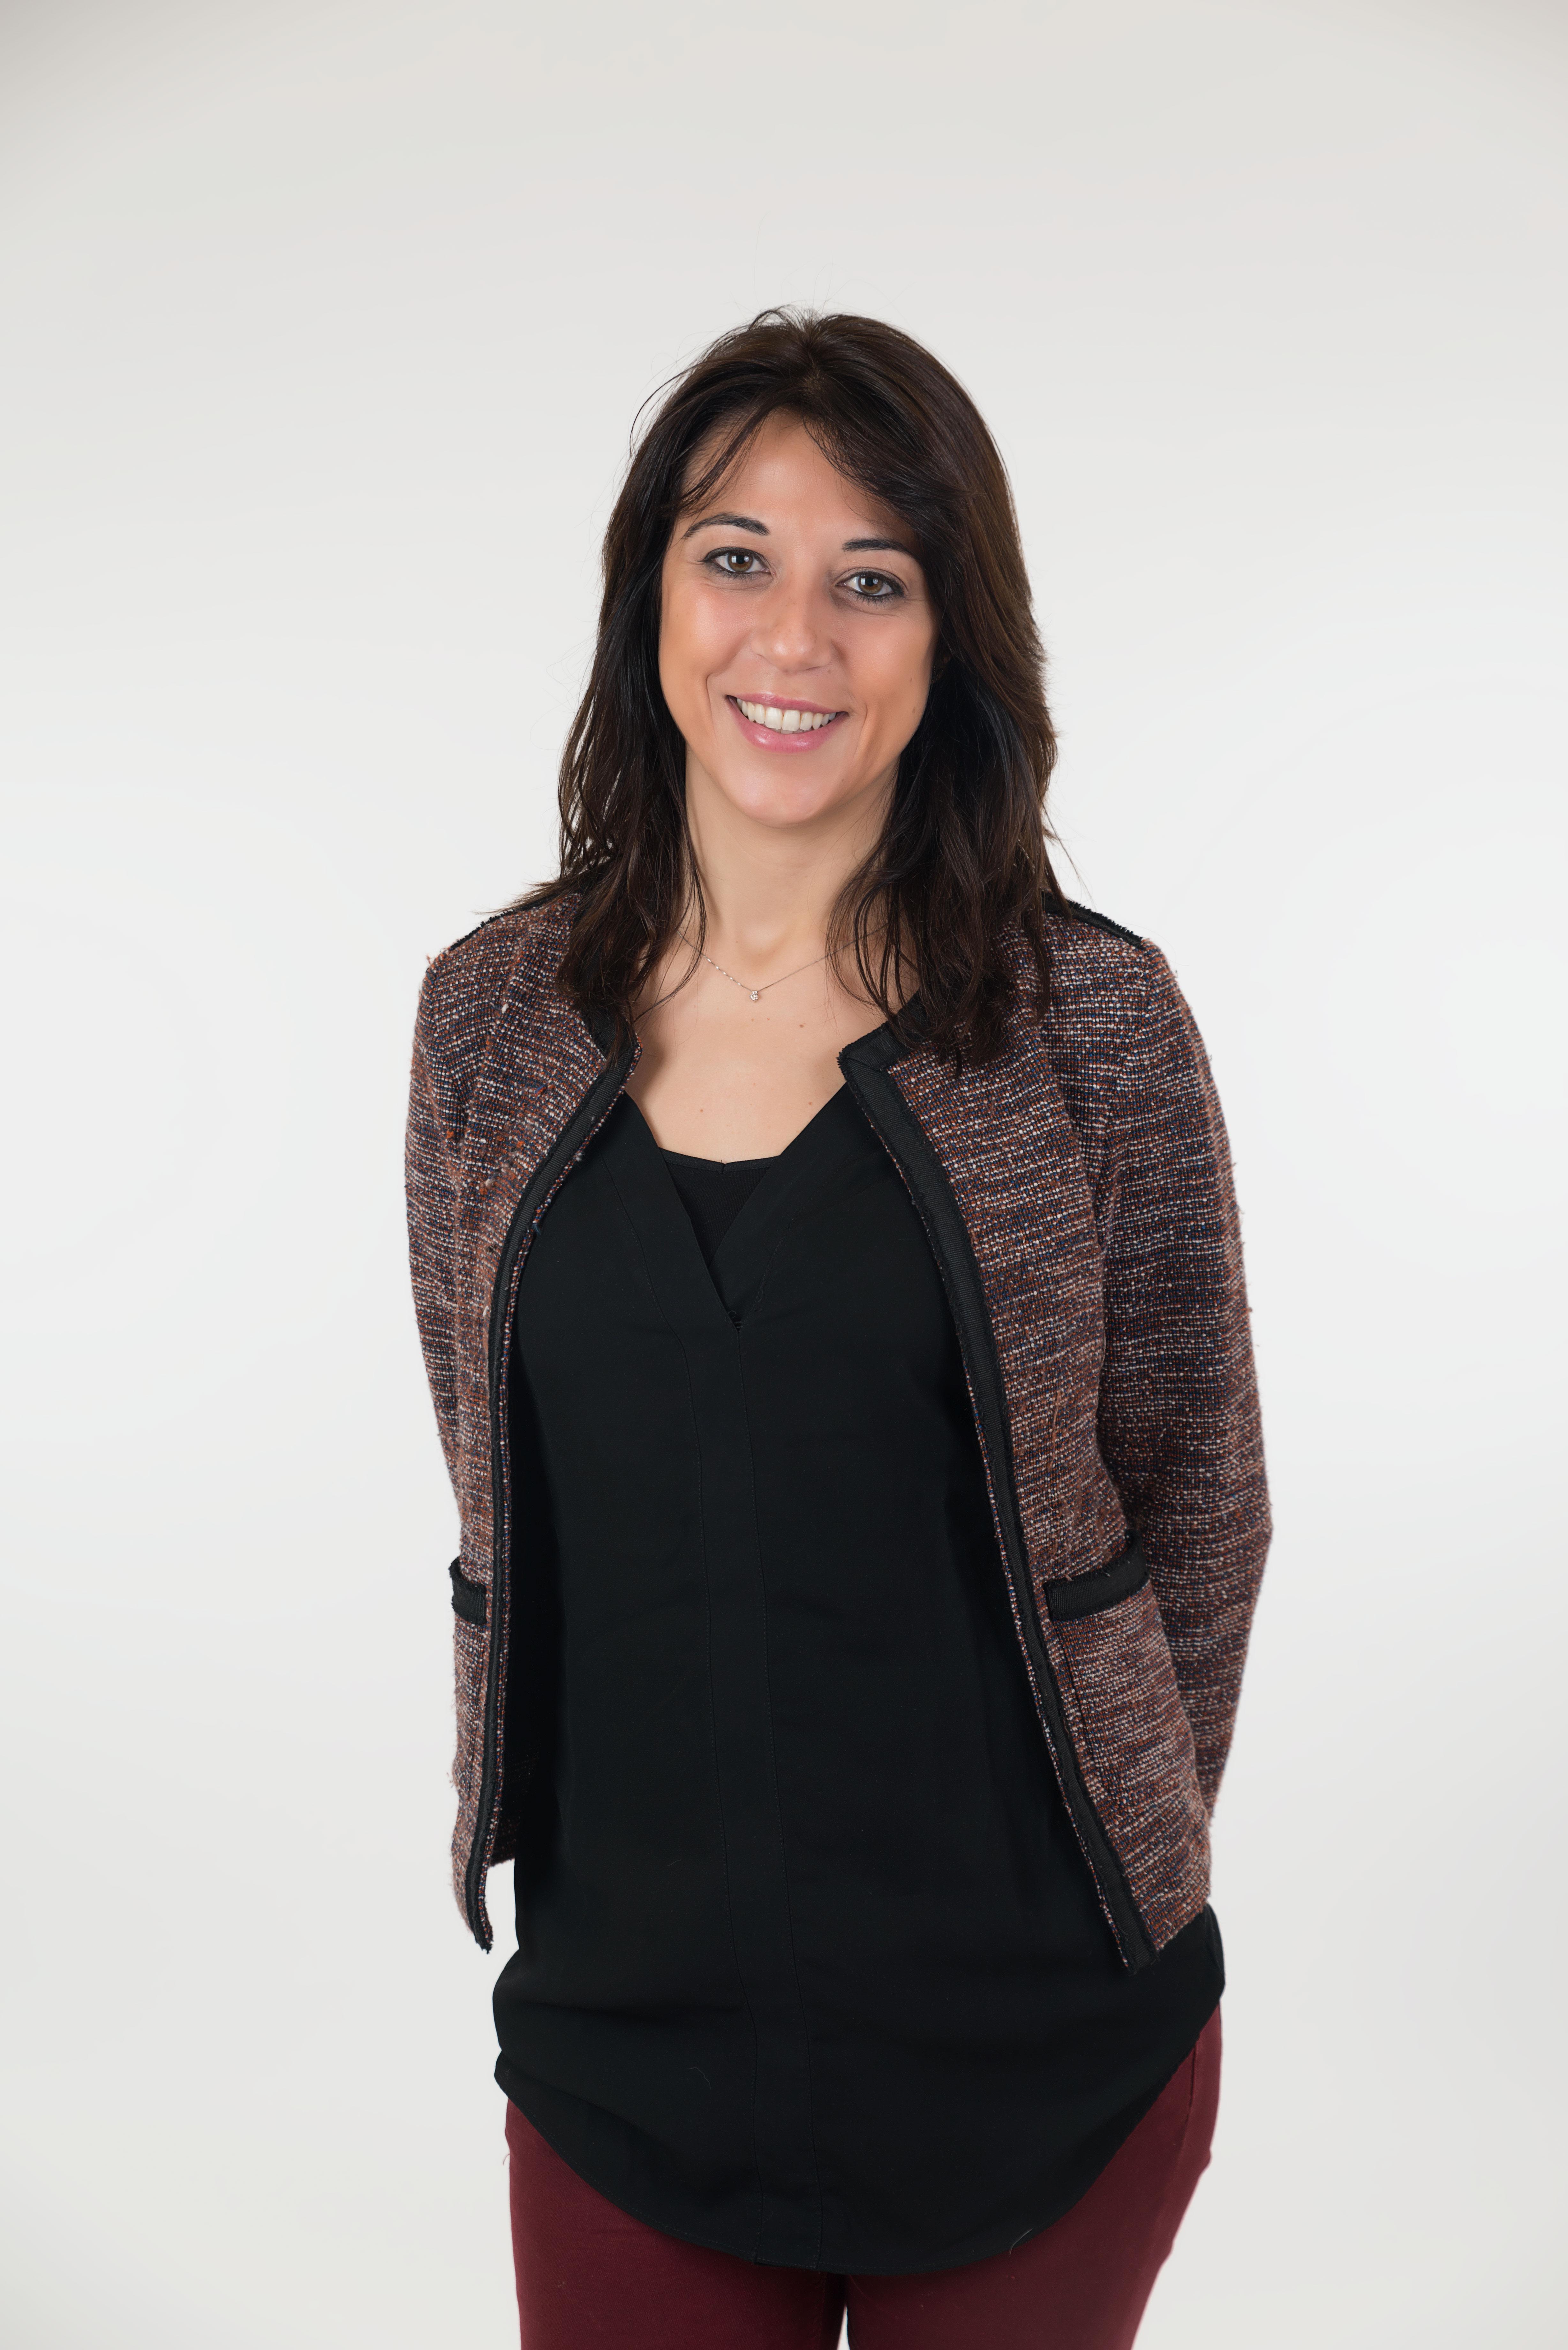 Dr.ssa Beatrice Brogi